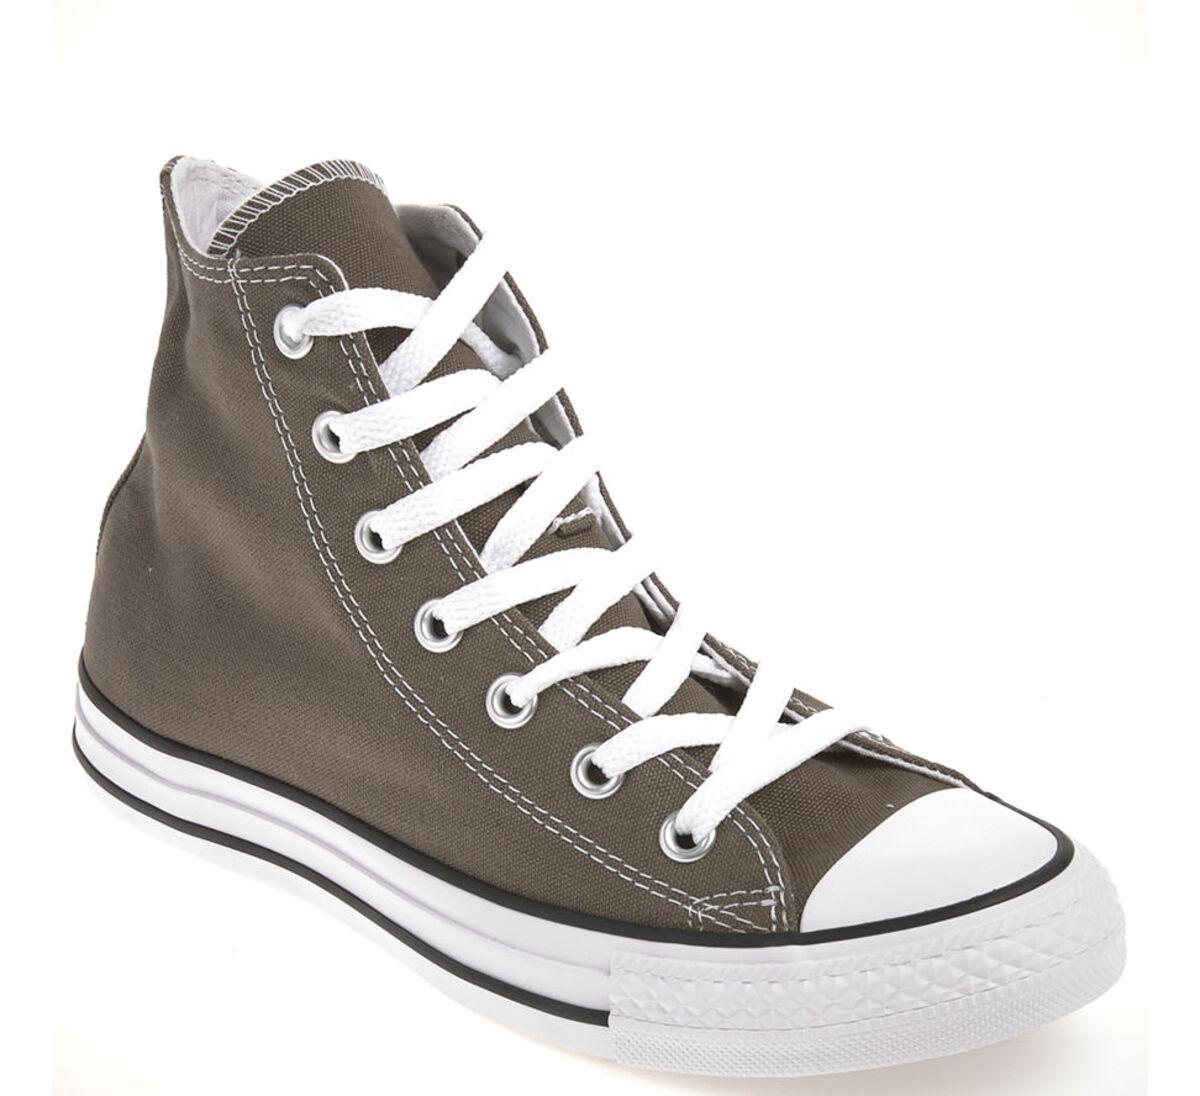 Bild 1 von Converse Sneaker - CHUCK TAYLOR ALL STAR HI